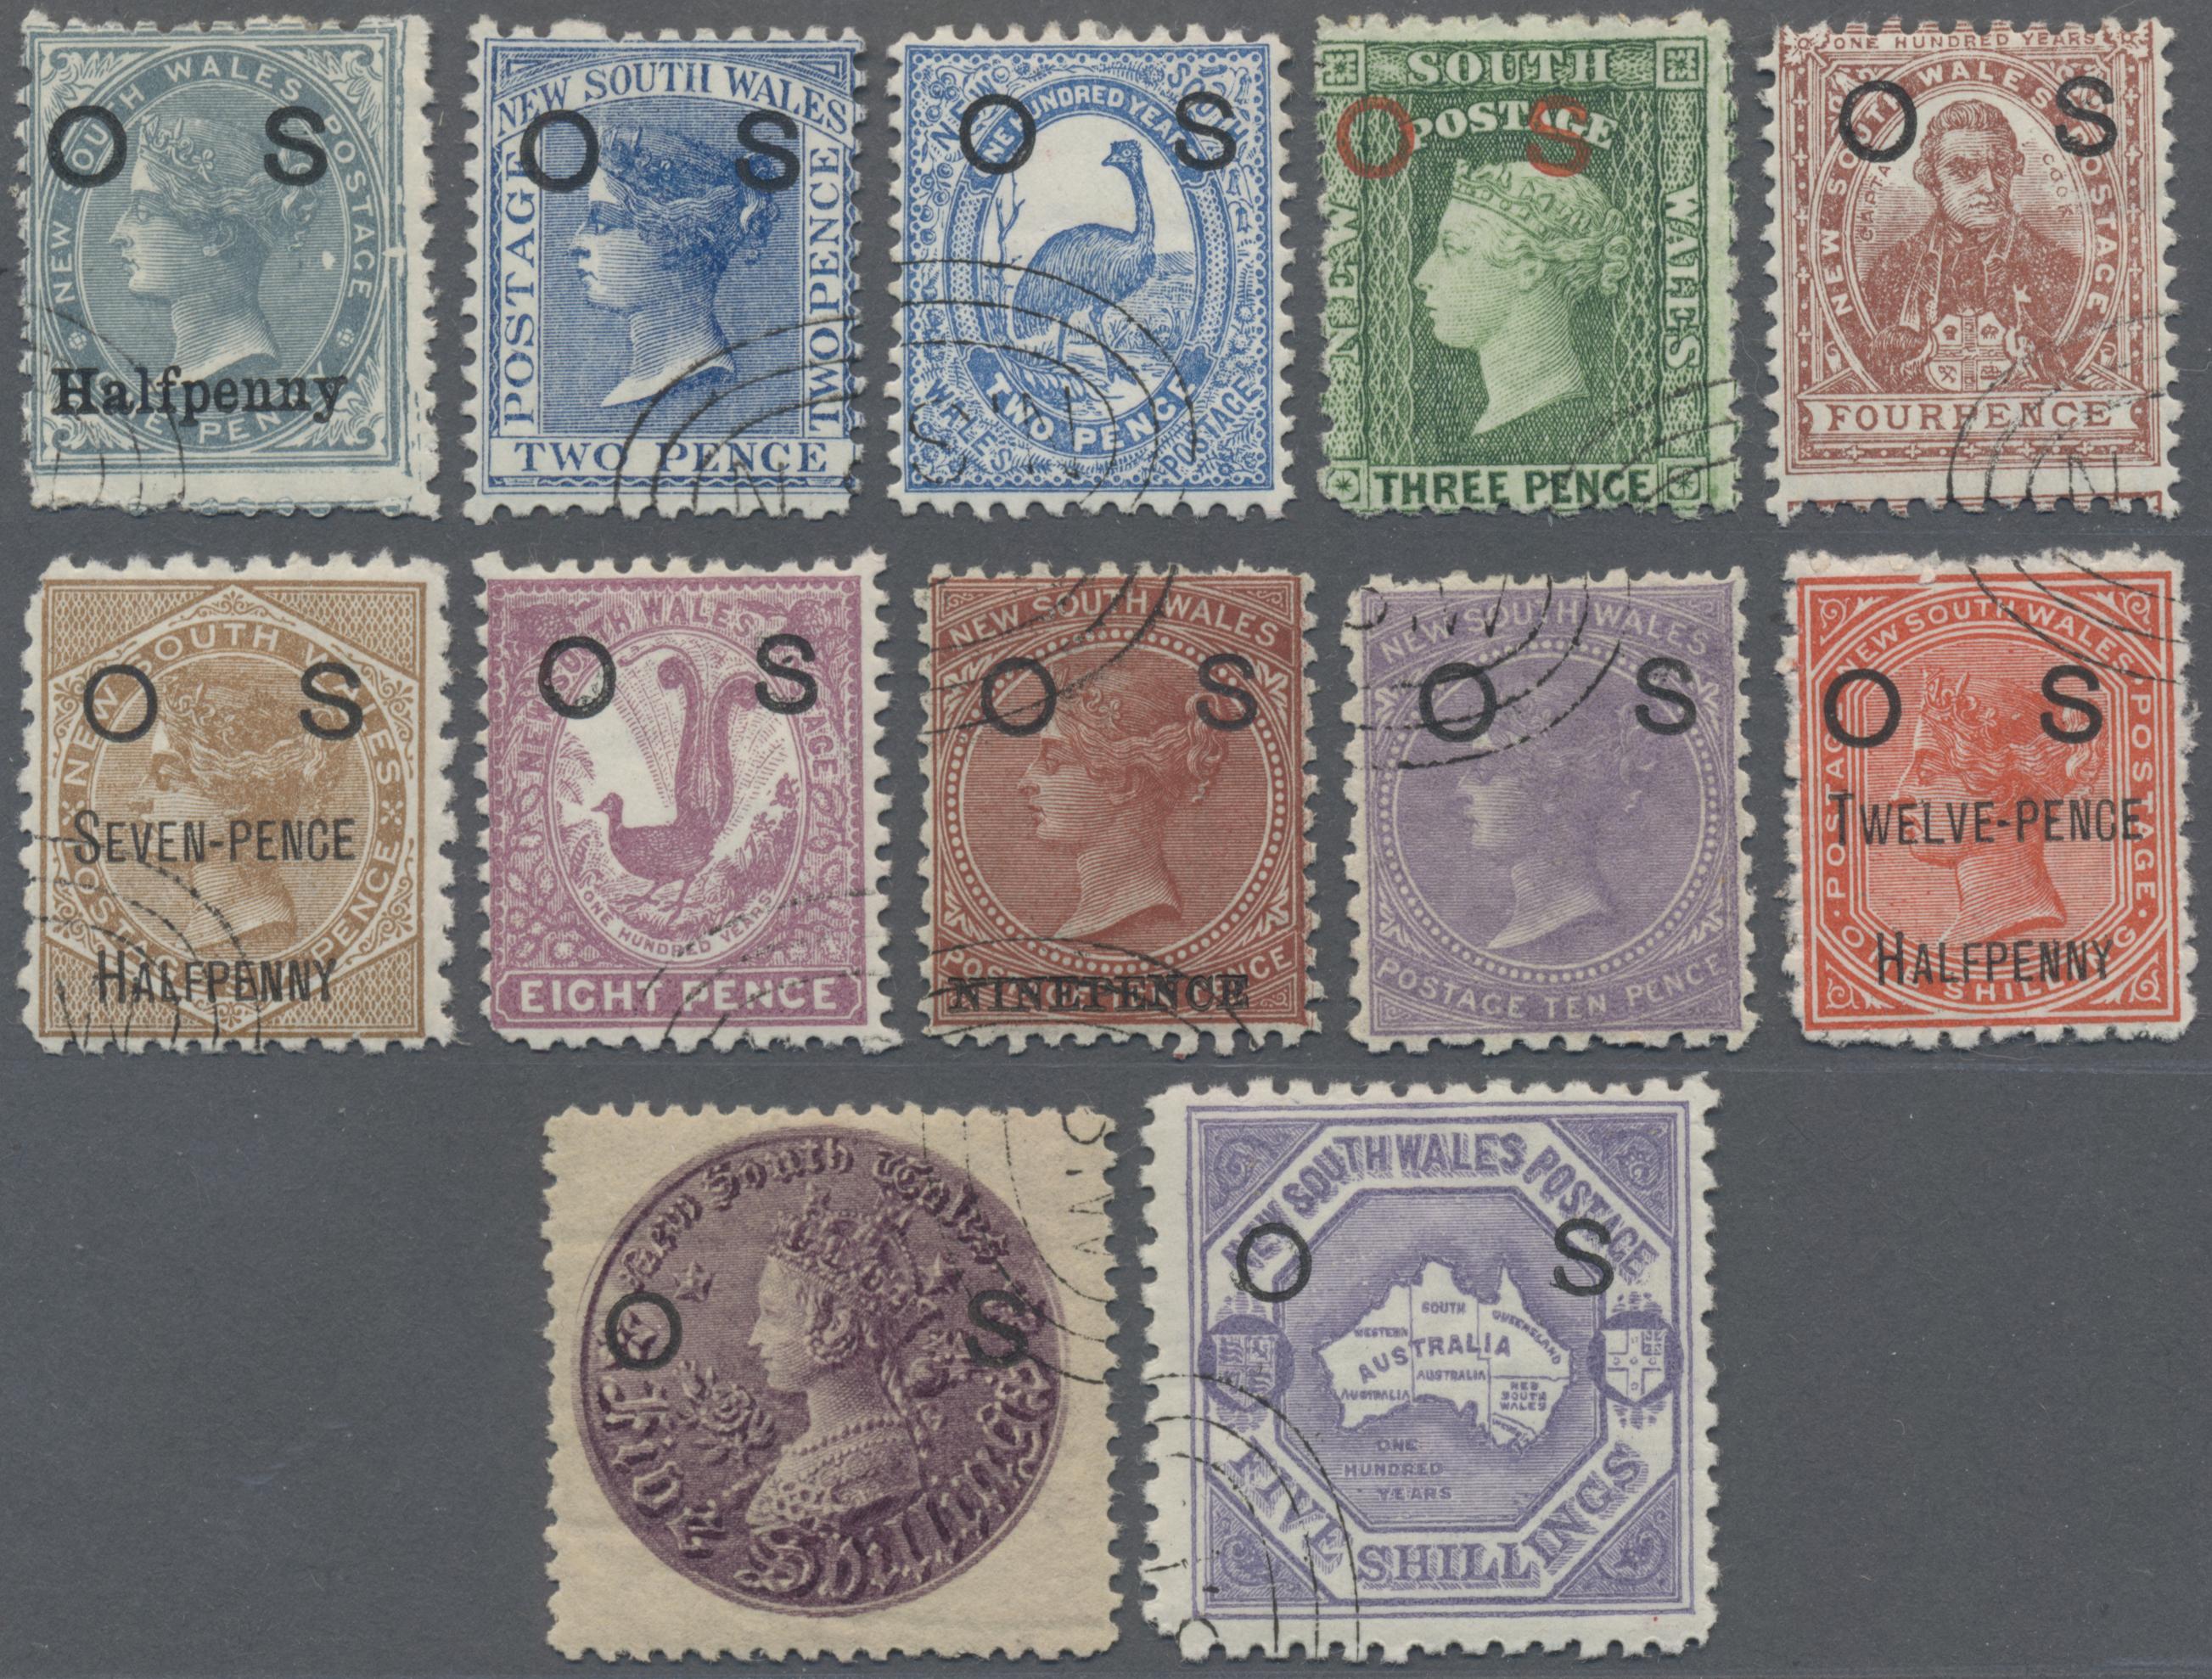 Lot 03012 - Neusüdwales - Dienstmarken  -  Auktionshaus Christoph Gärtner GmbH & Co. KG Sale #49 Special catalogue Australia, USA – Wells Fargo